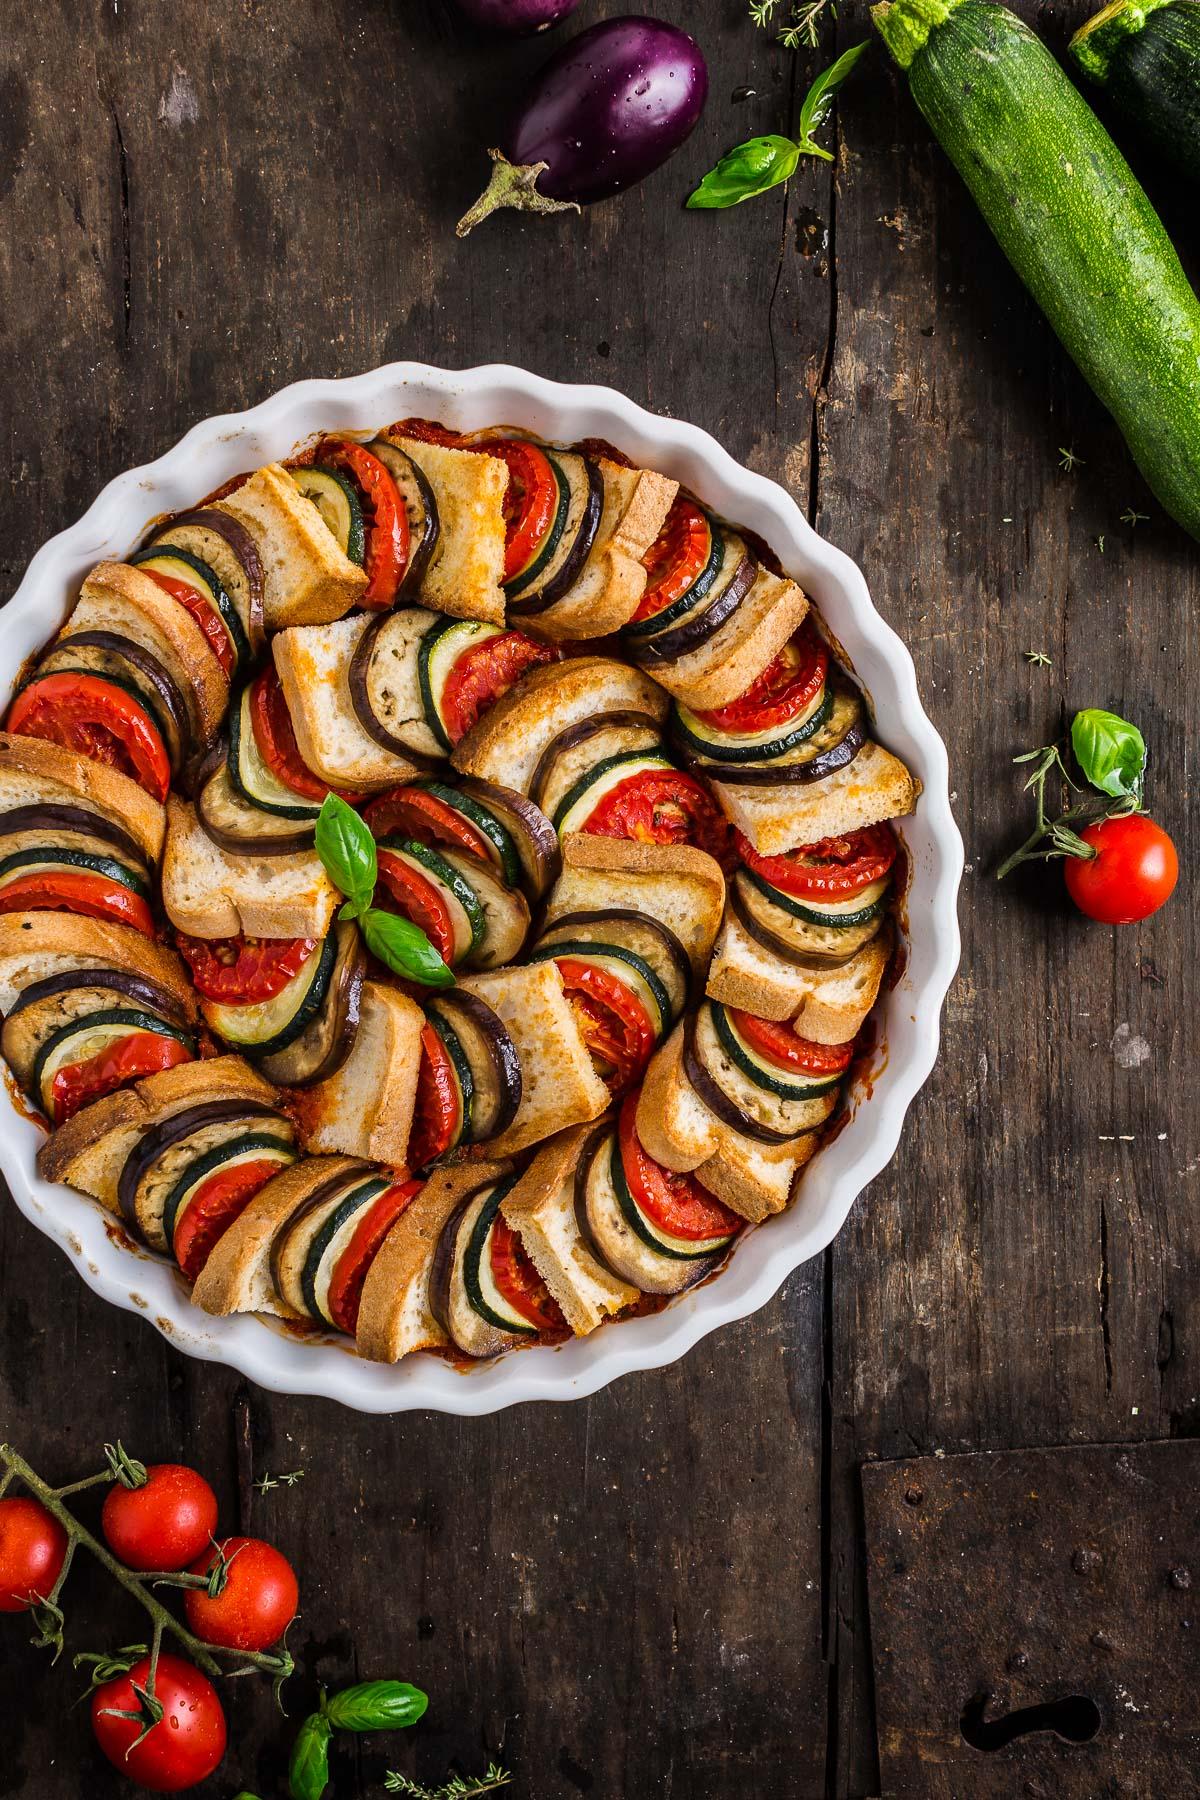 VEGETABLE BREAD RATATOUILLE TIAN recipe - TIAN RATATOUILLE di pane senza glutine con verdure melanzane zucchine pomodori